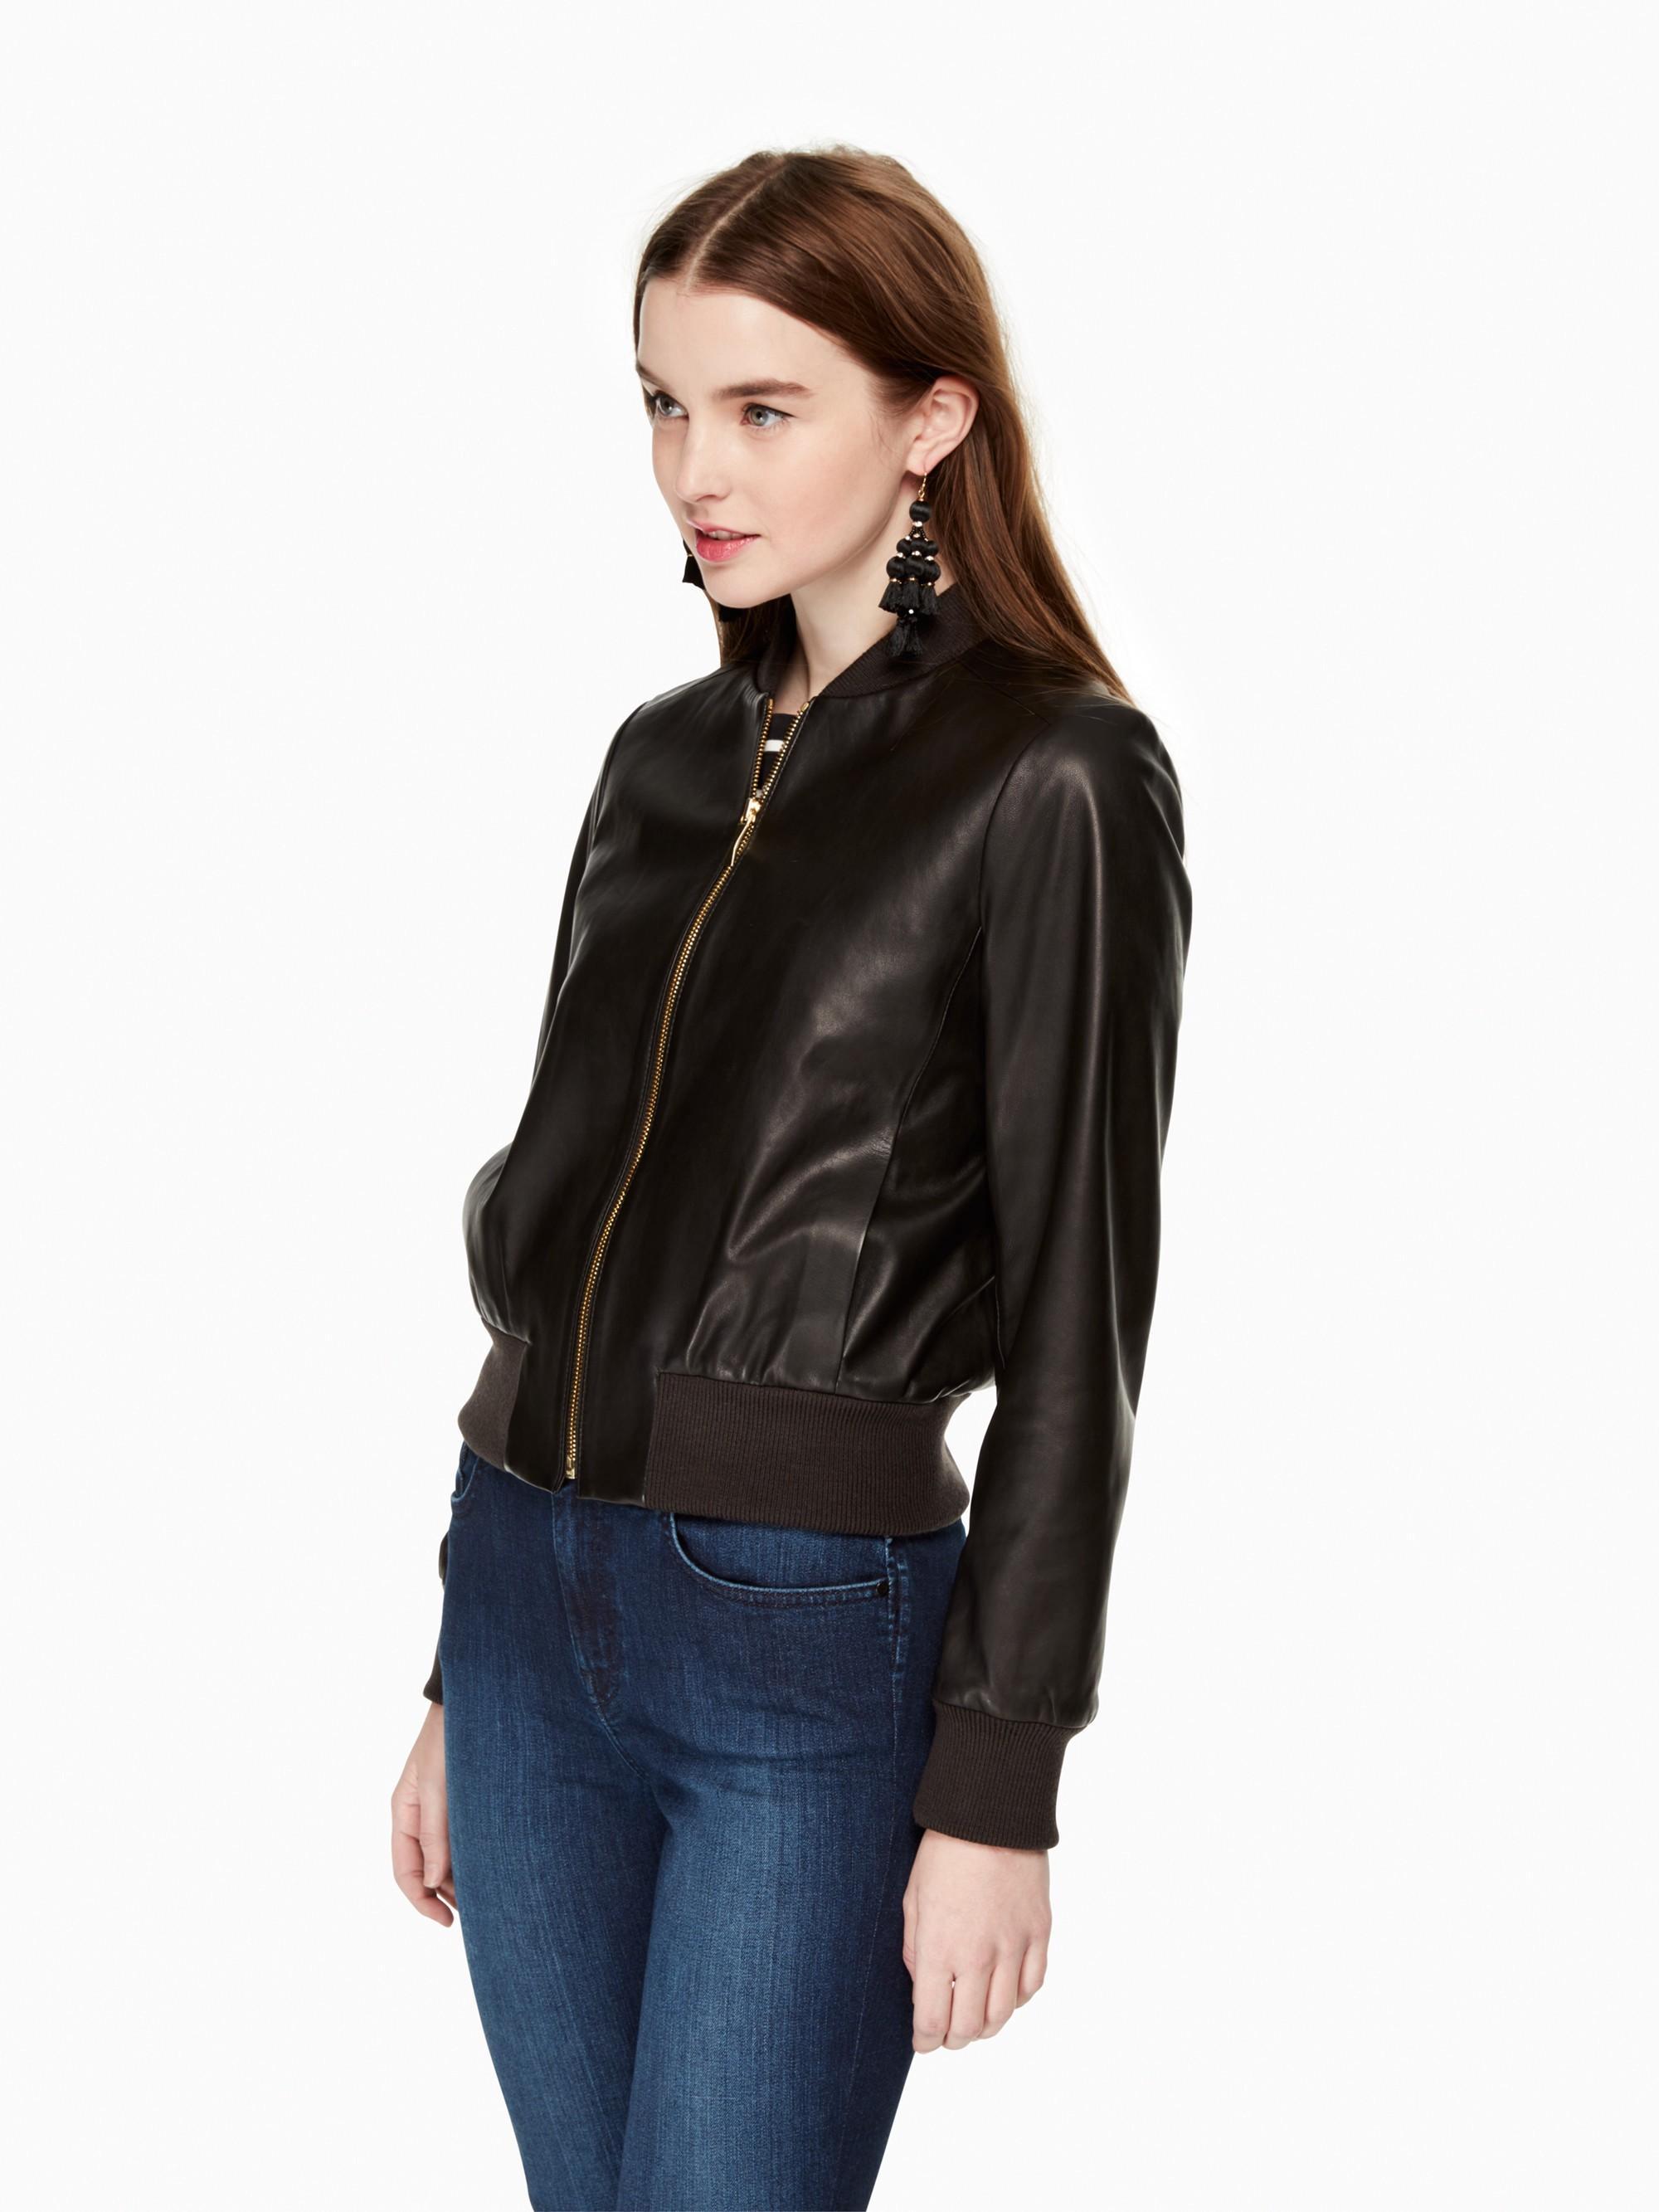 Kate Spade Leather Bomber Jacket In Black